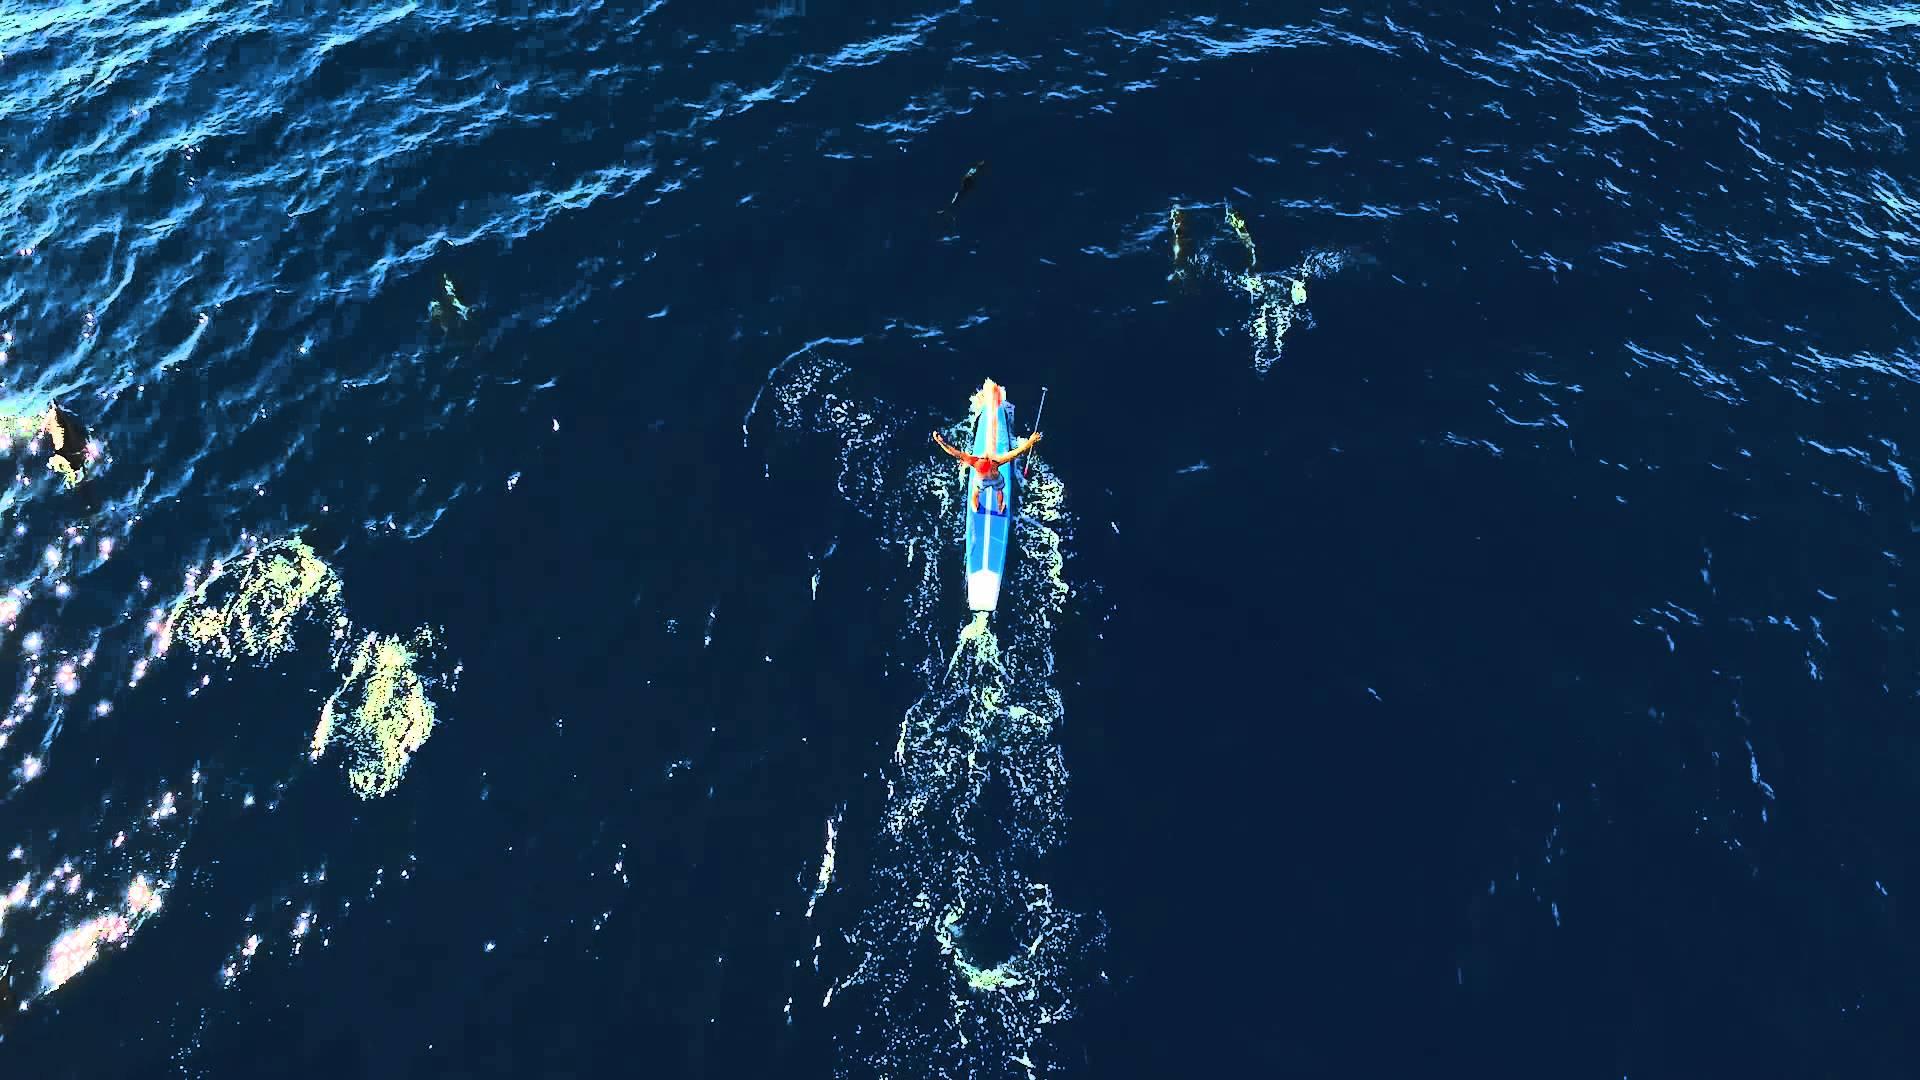 Zane Schweitzer Paddling with Dozens of Dolphins  in Oahu, Hawaii